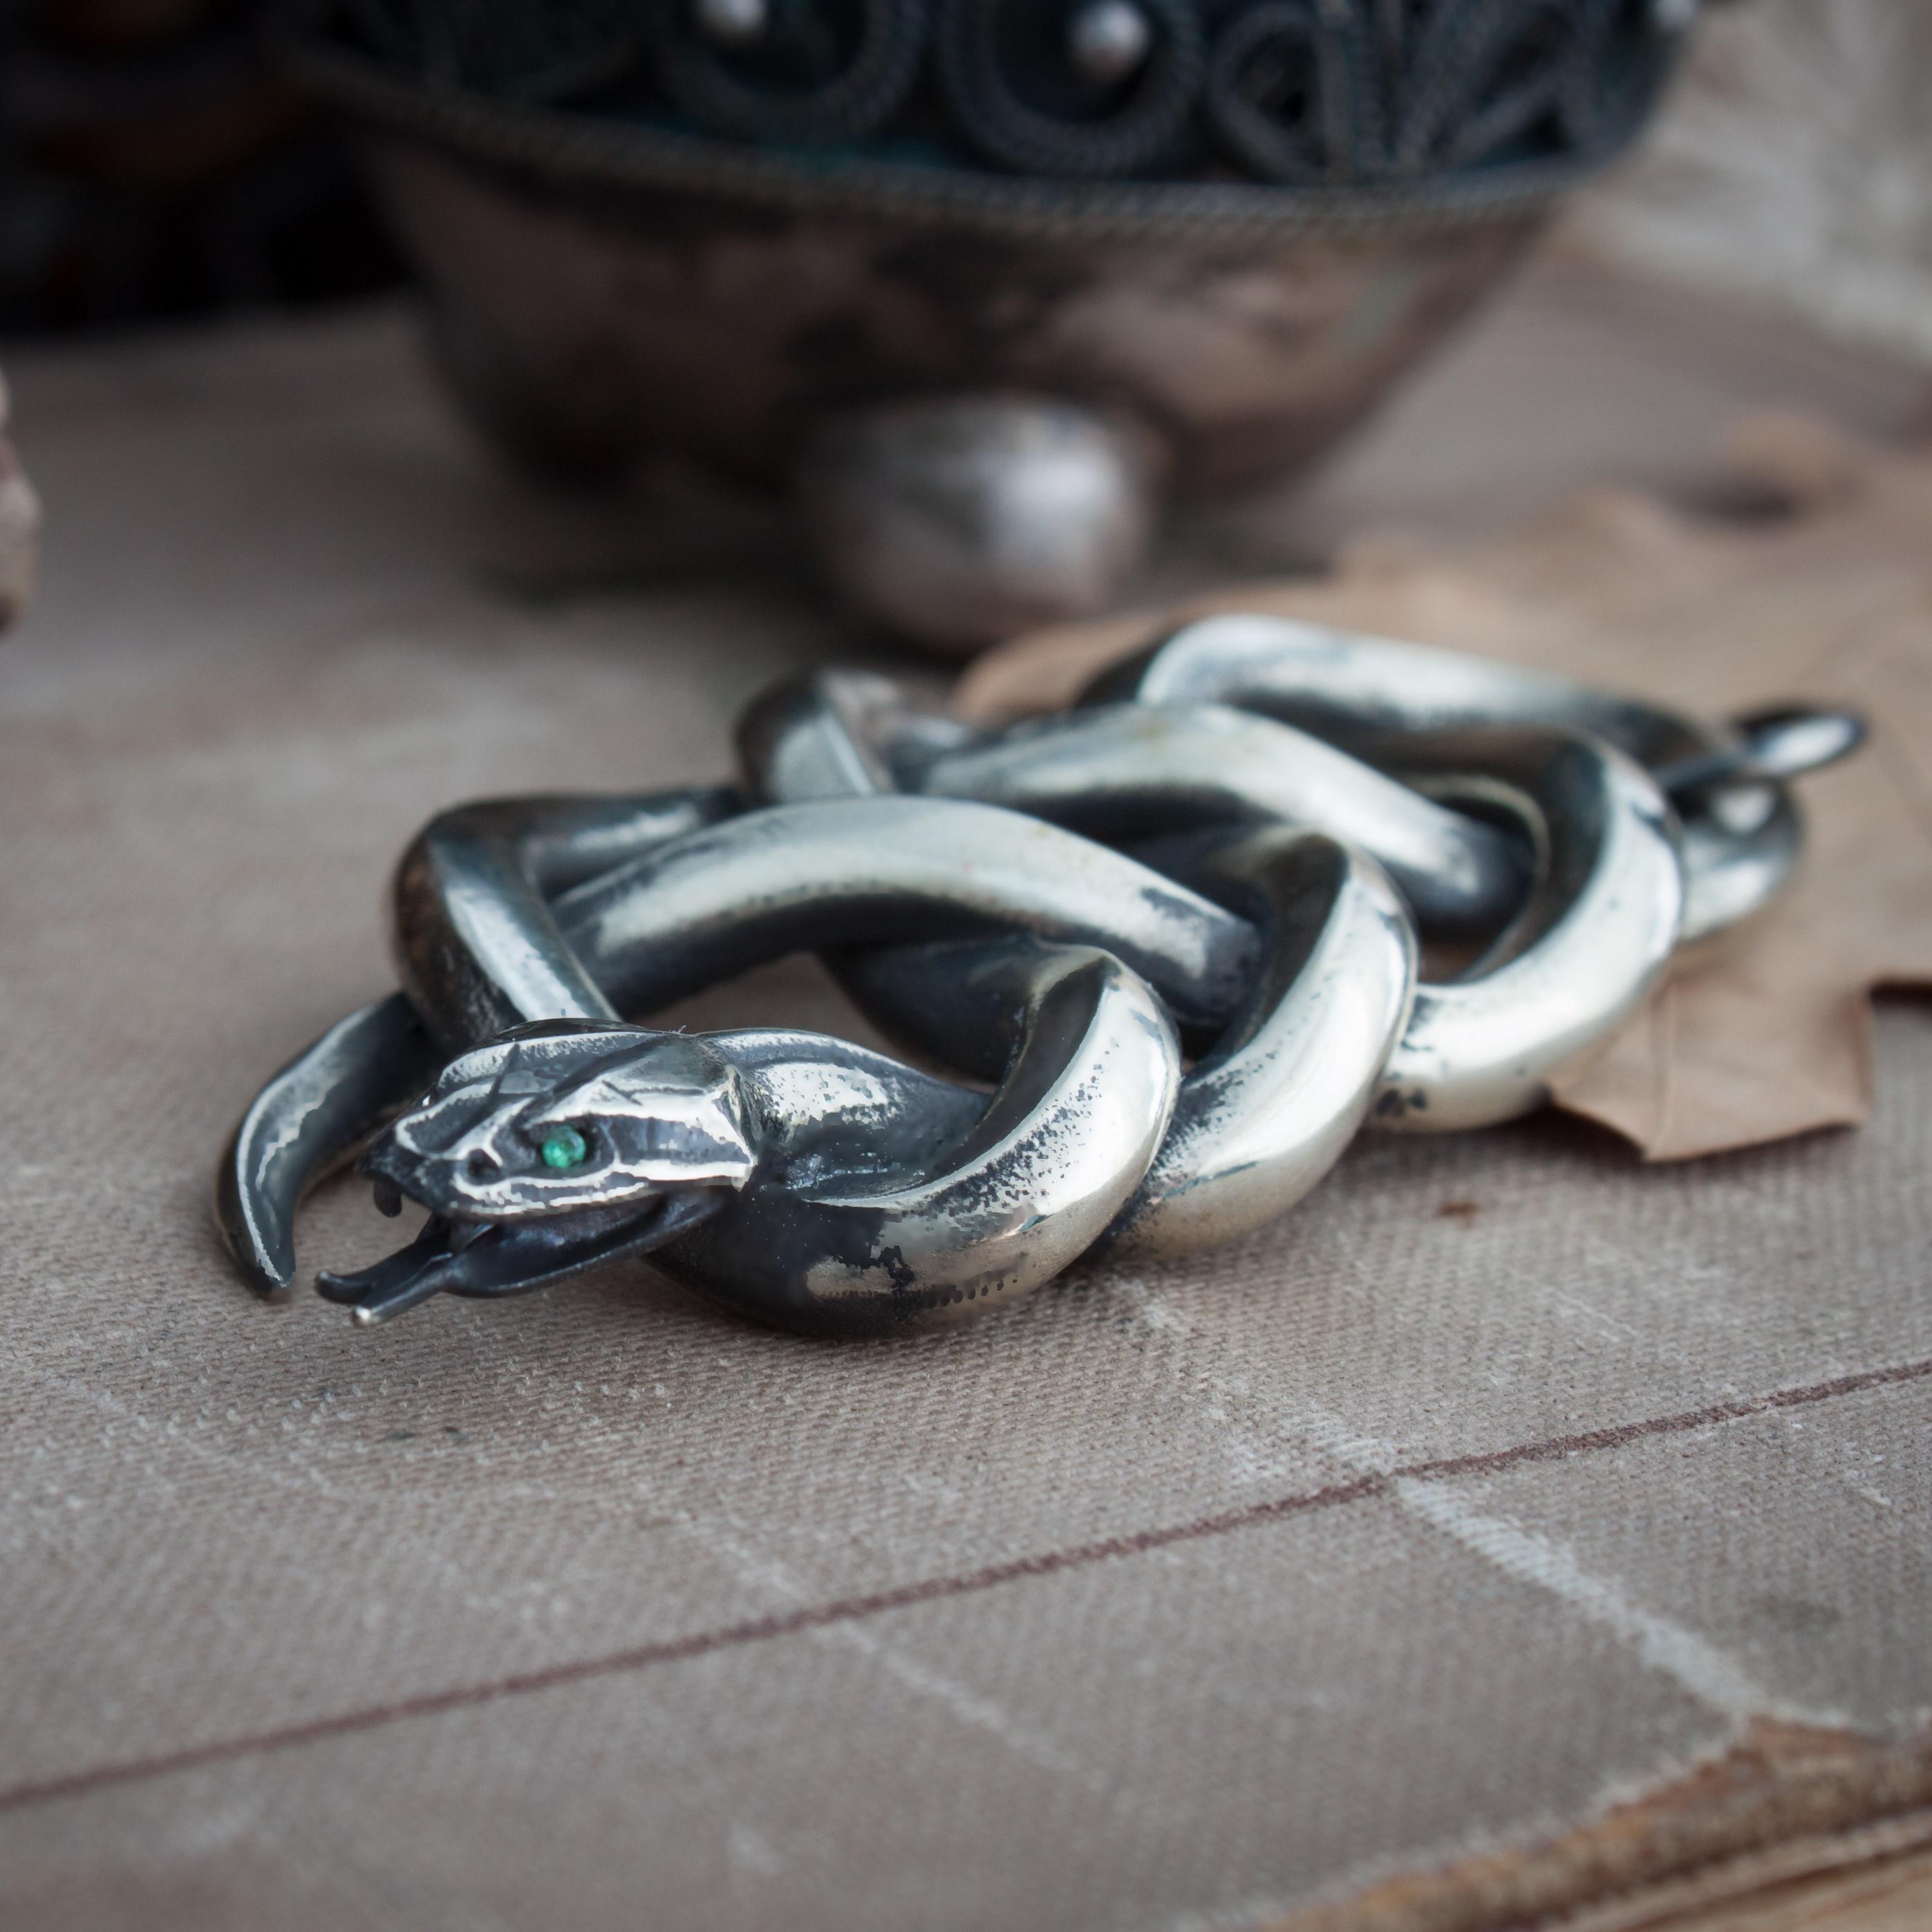 Collectibles Viper School Medallion Serpent Pendant Witcher